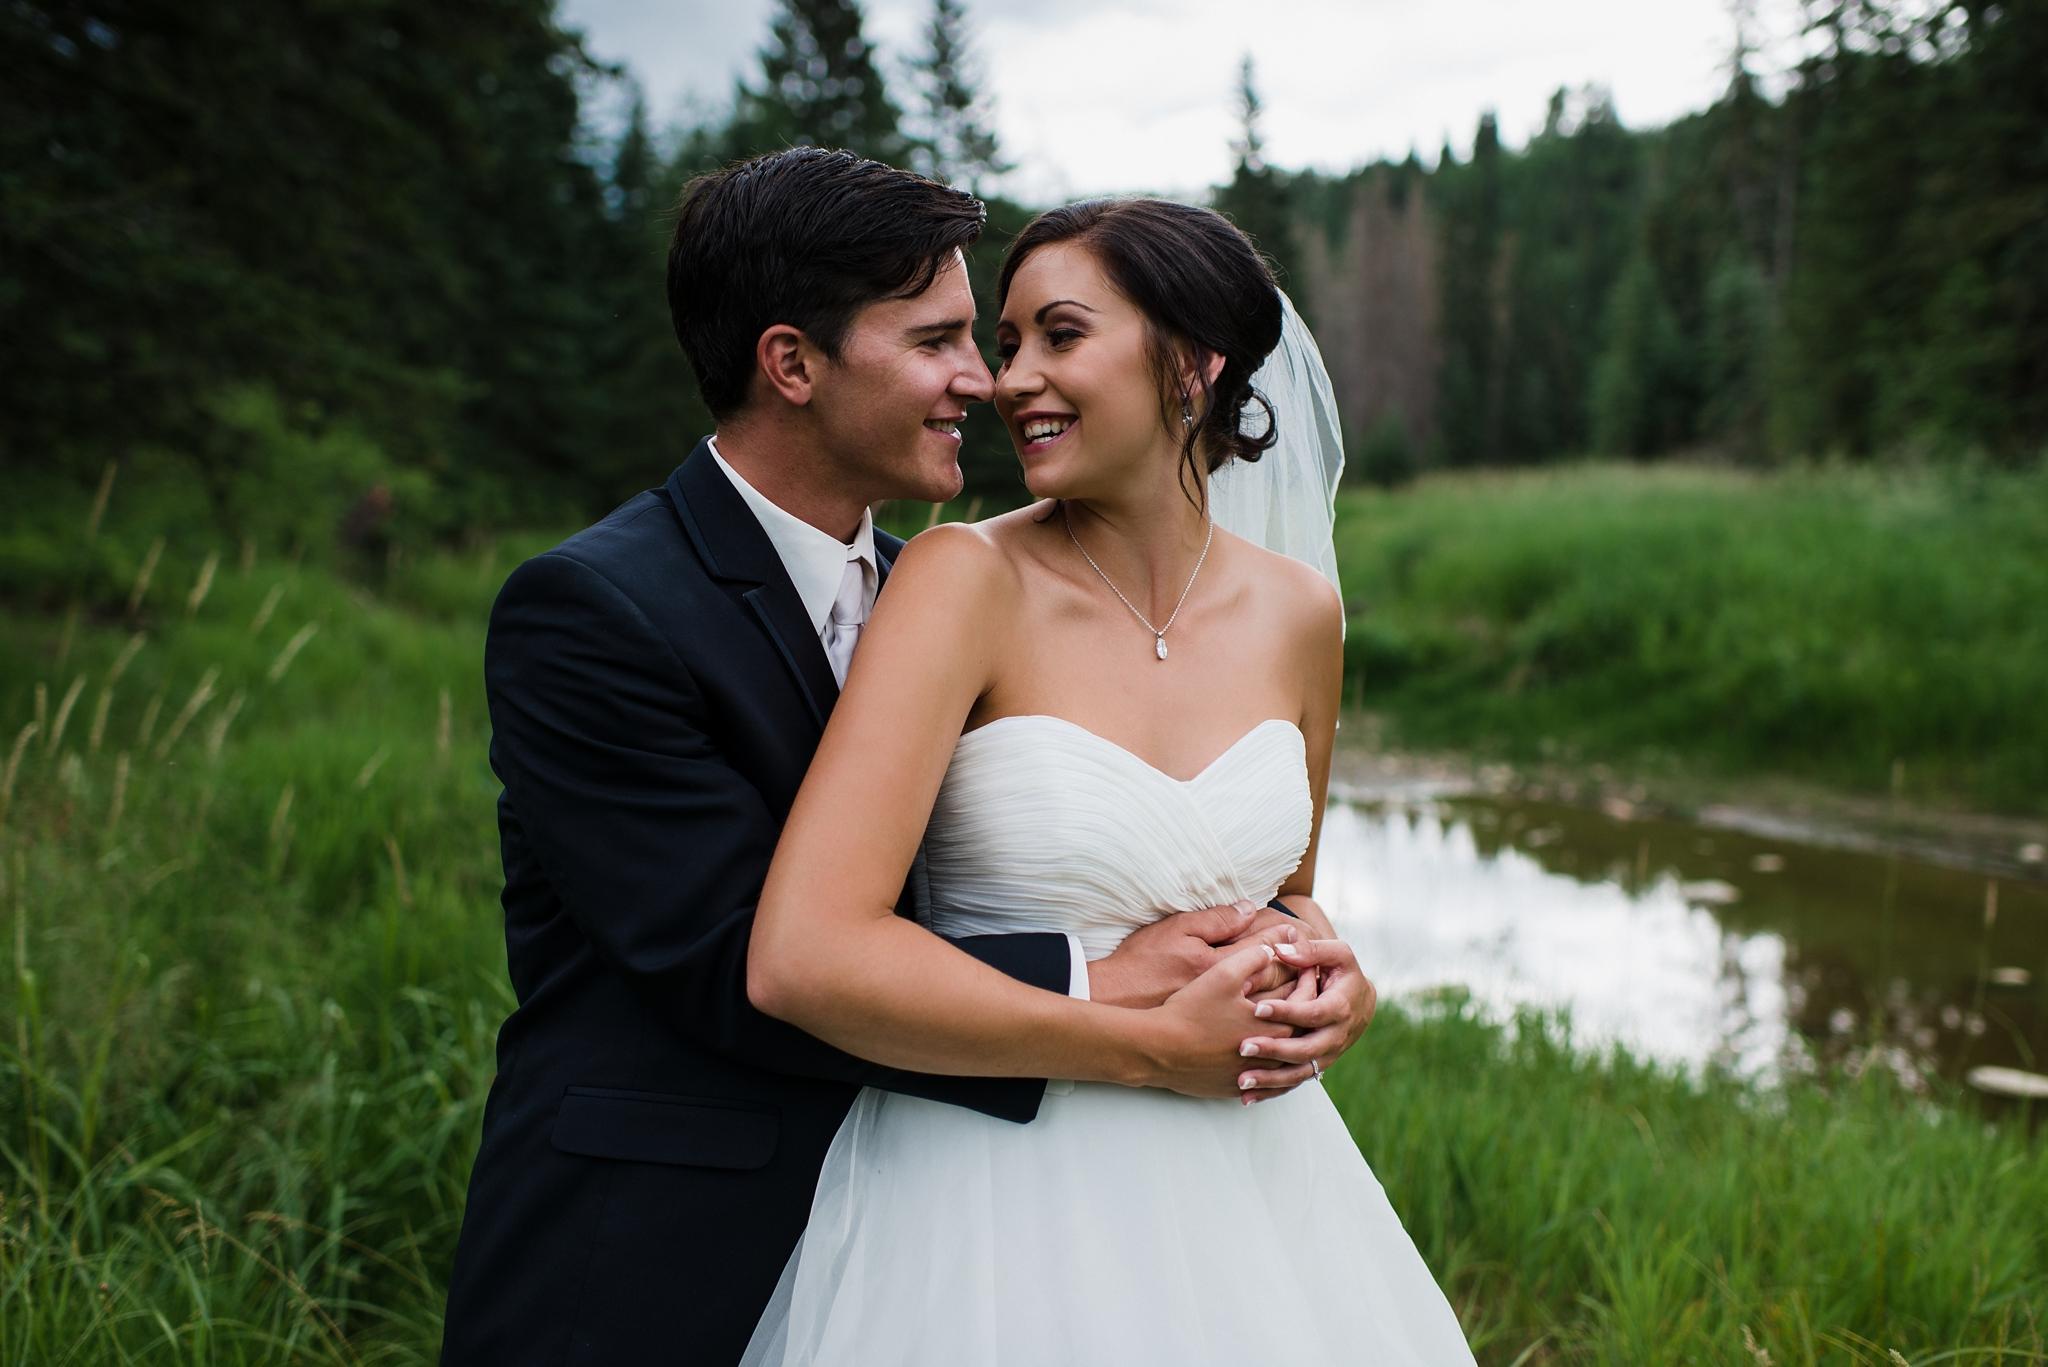 kaihla_tonai_intimate_wedding_elopement_photographer_0097